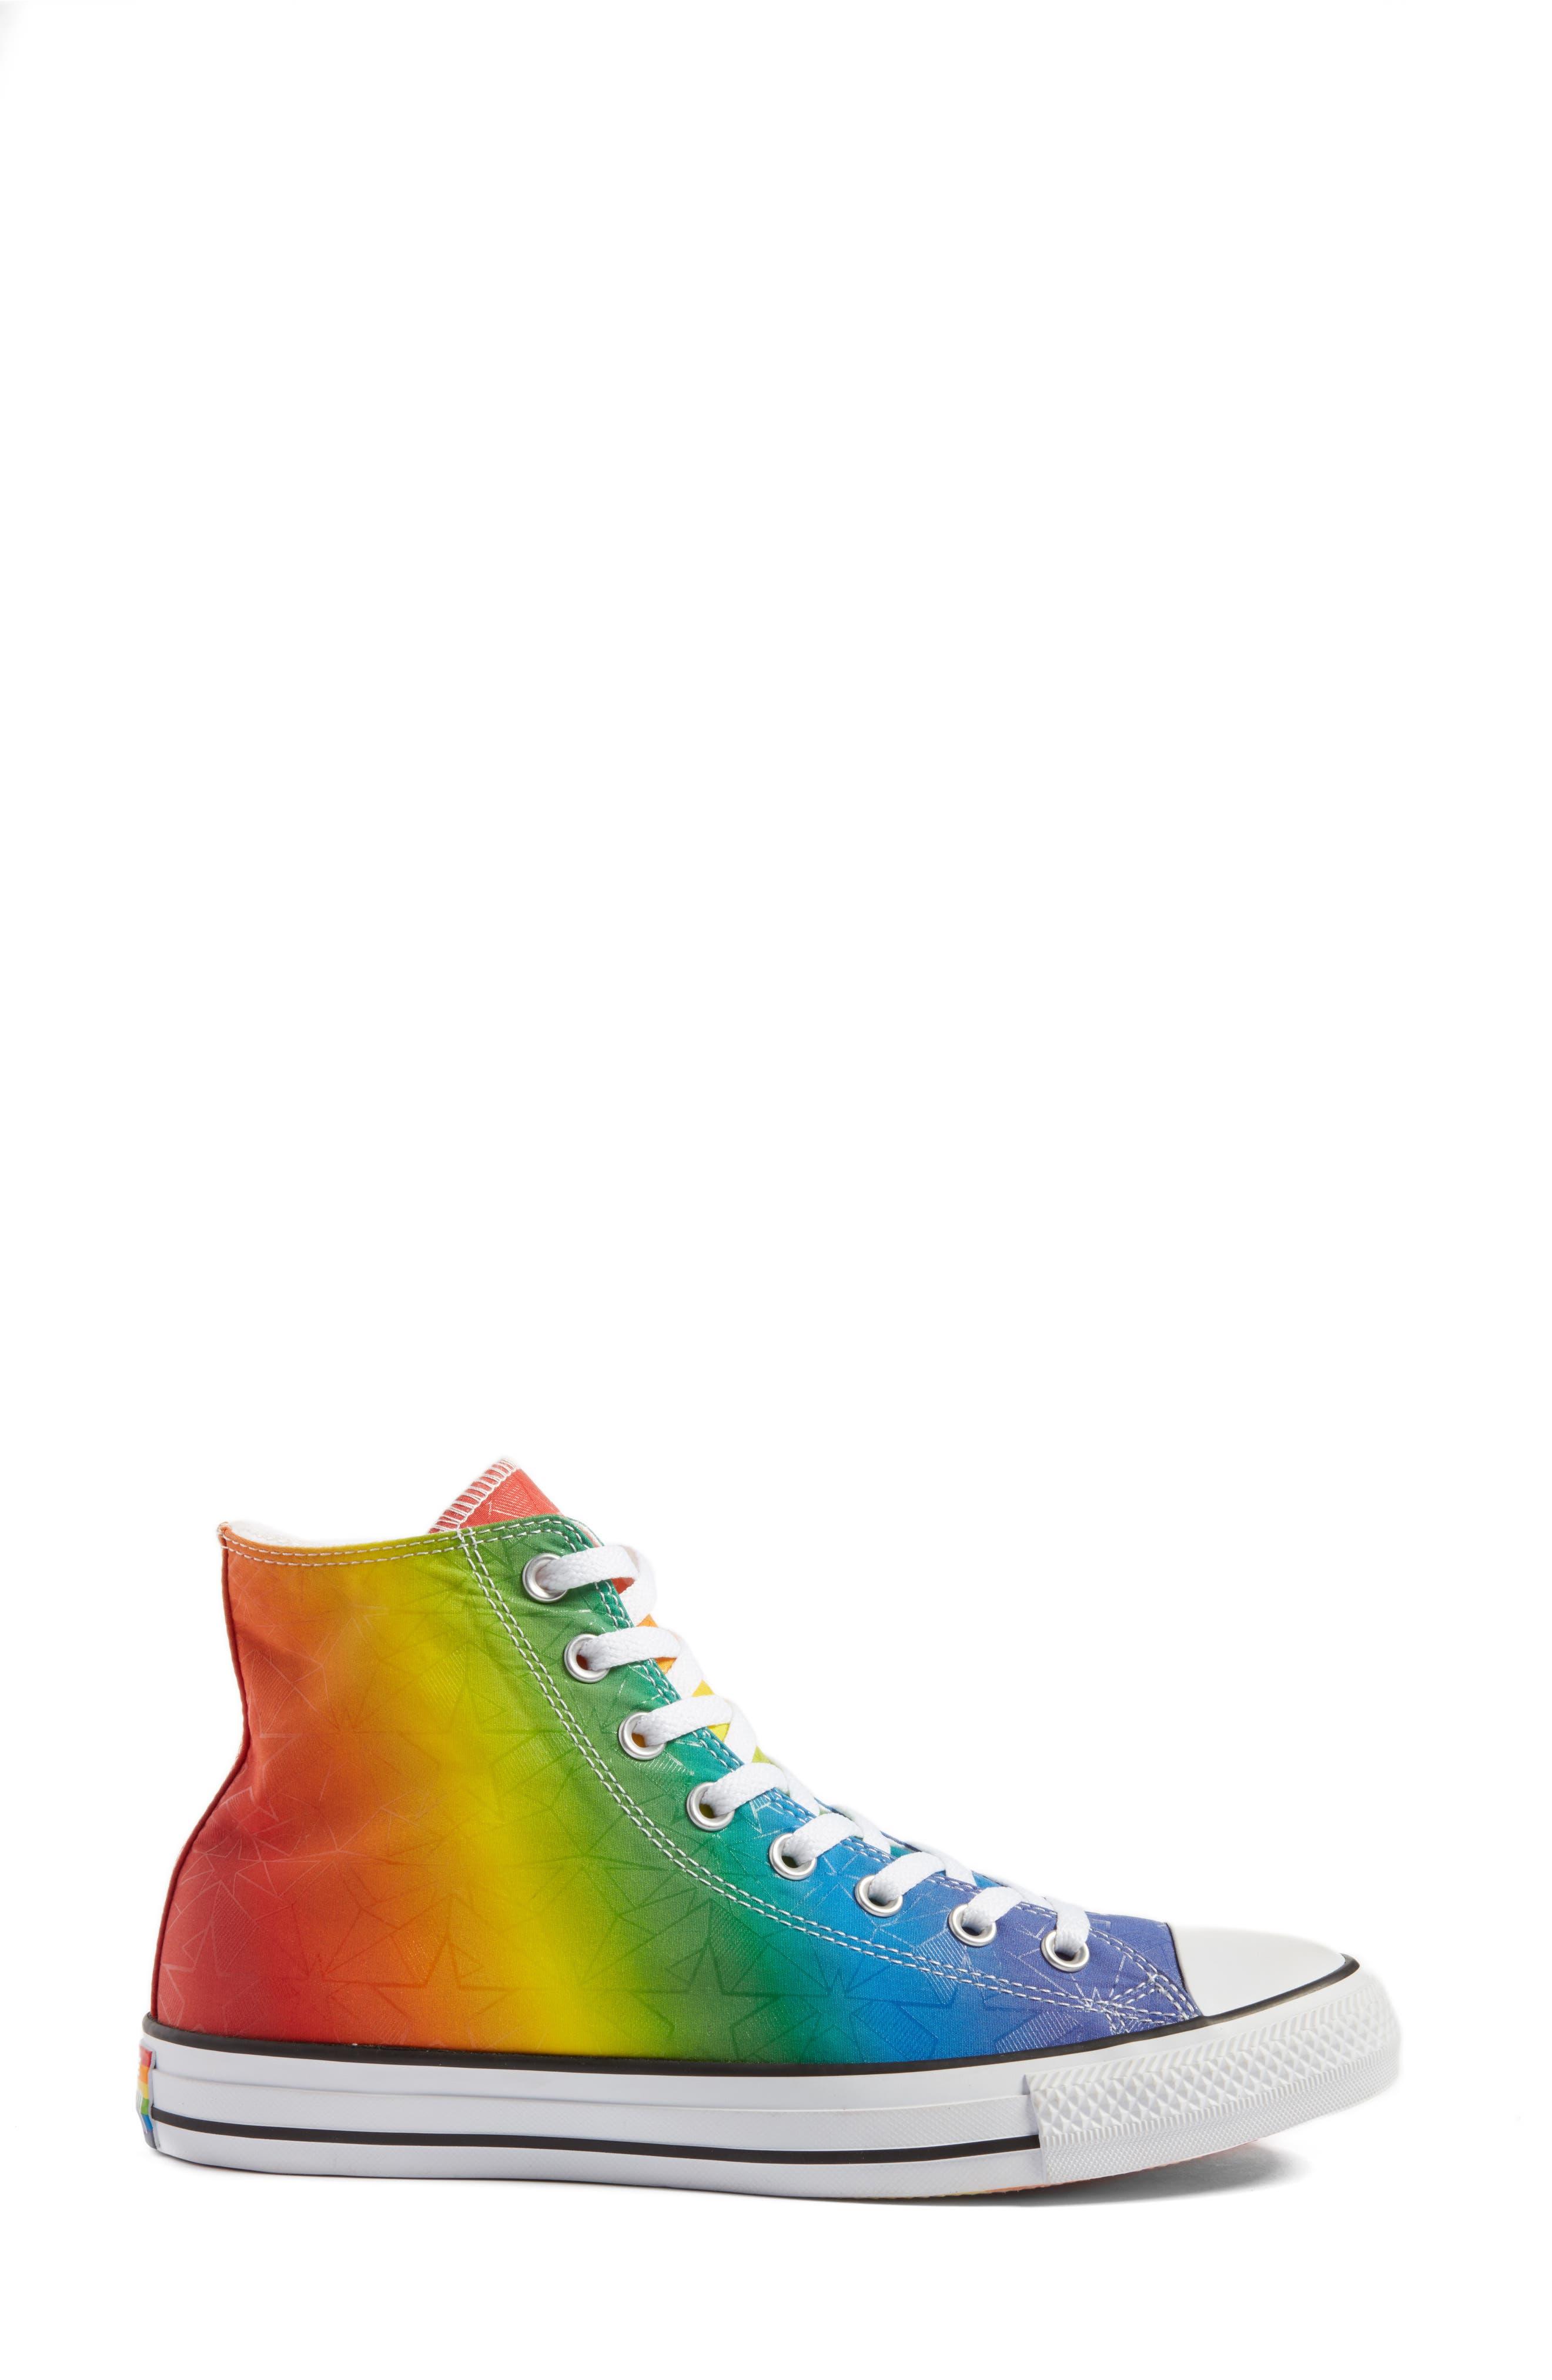 Alternate Image 3  - Converse Chuck Taylor® All Star® Pride High Top Sneaker (Women)